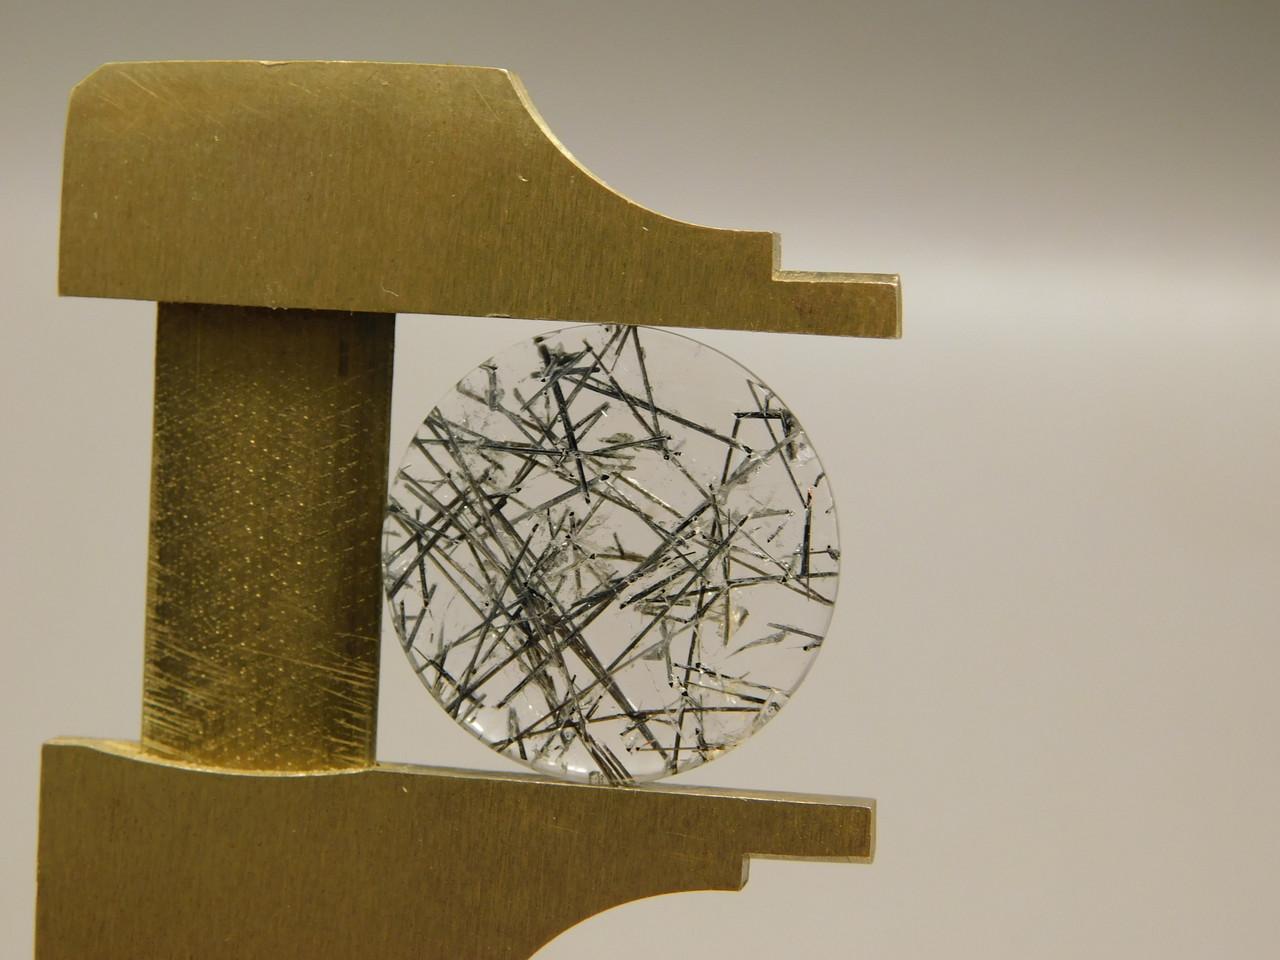 18 mm Round Tourmaline Quartz Crystal Stone Cabochon #22